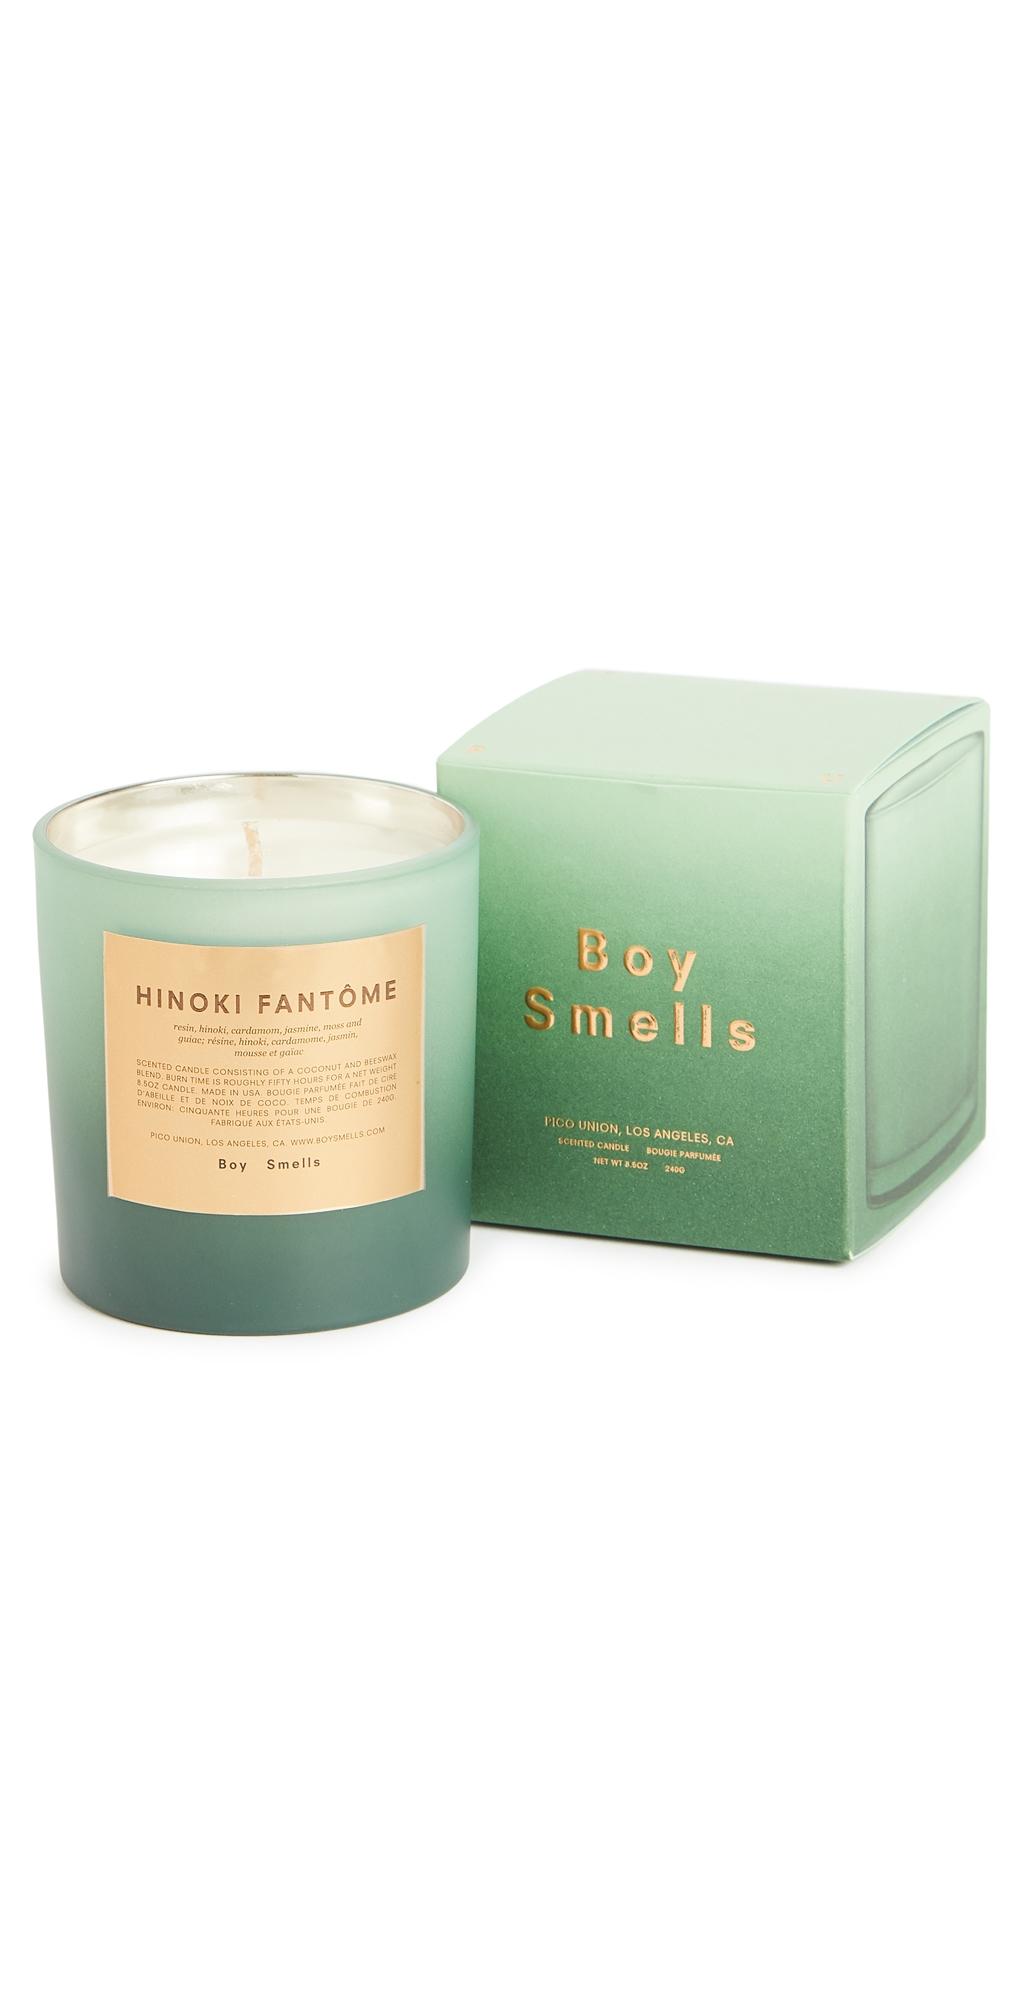 Boy Smells Hinoki Fantome Candle